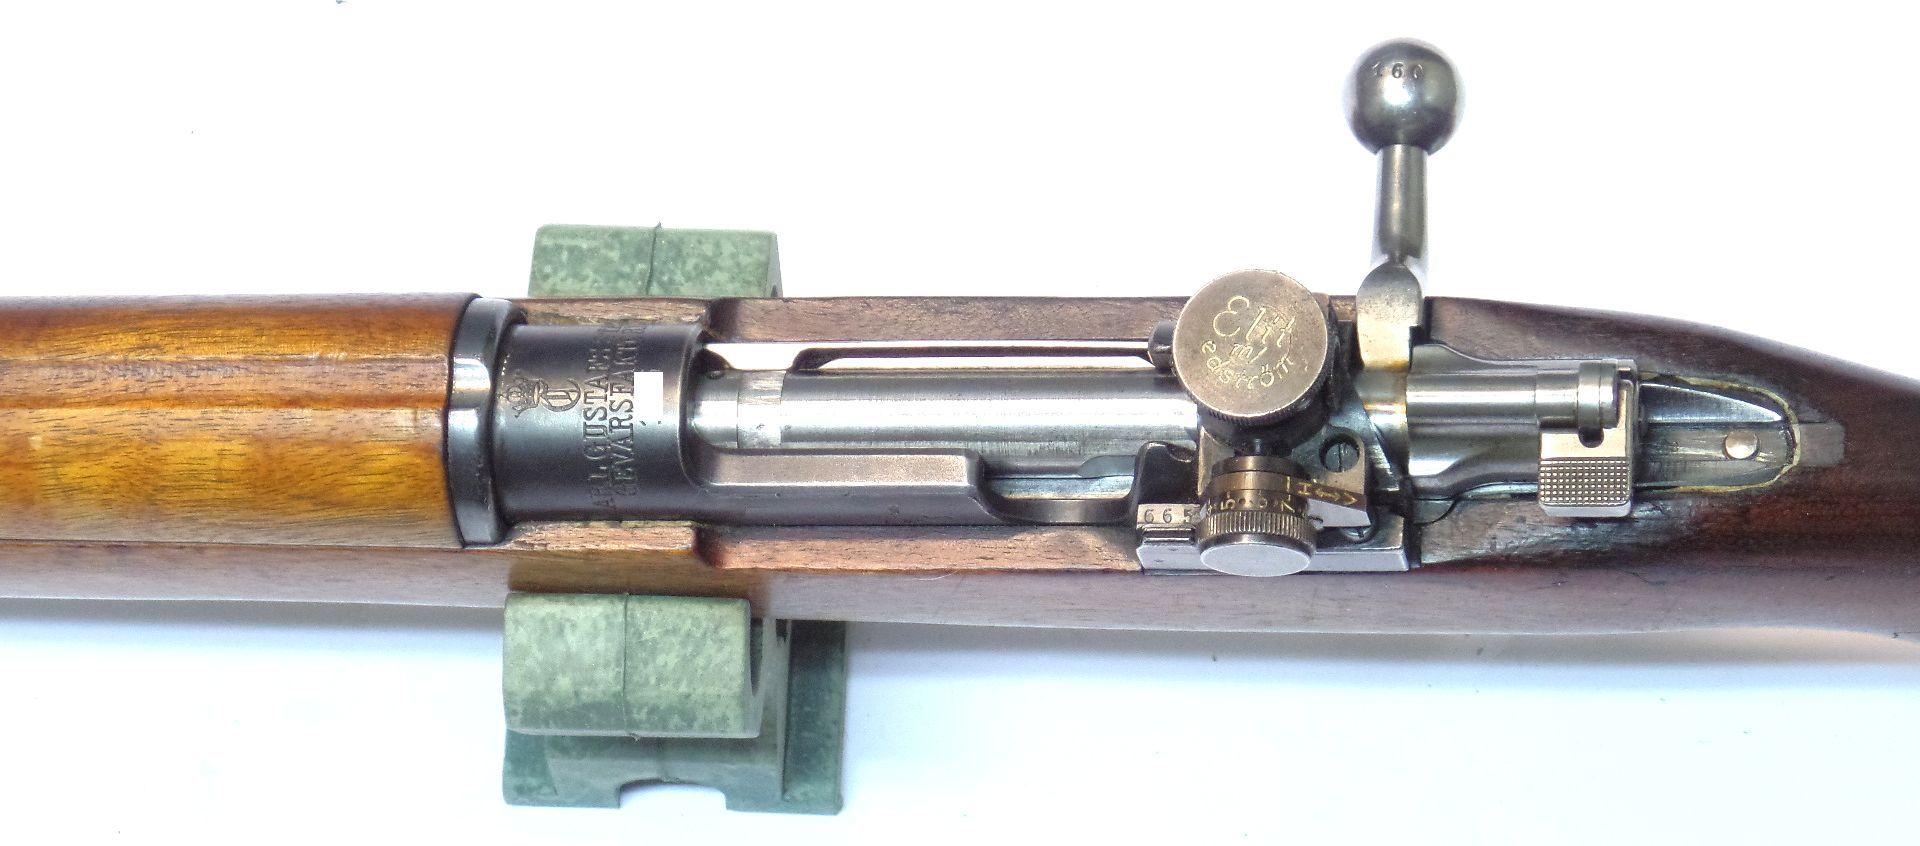 CARL GUSTAV M63 calibre 6.5x55